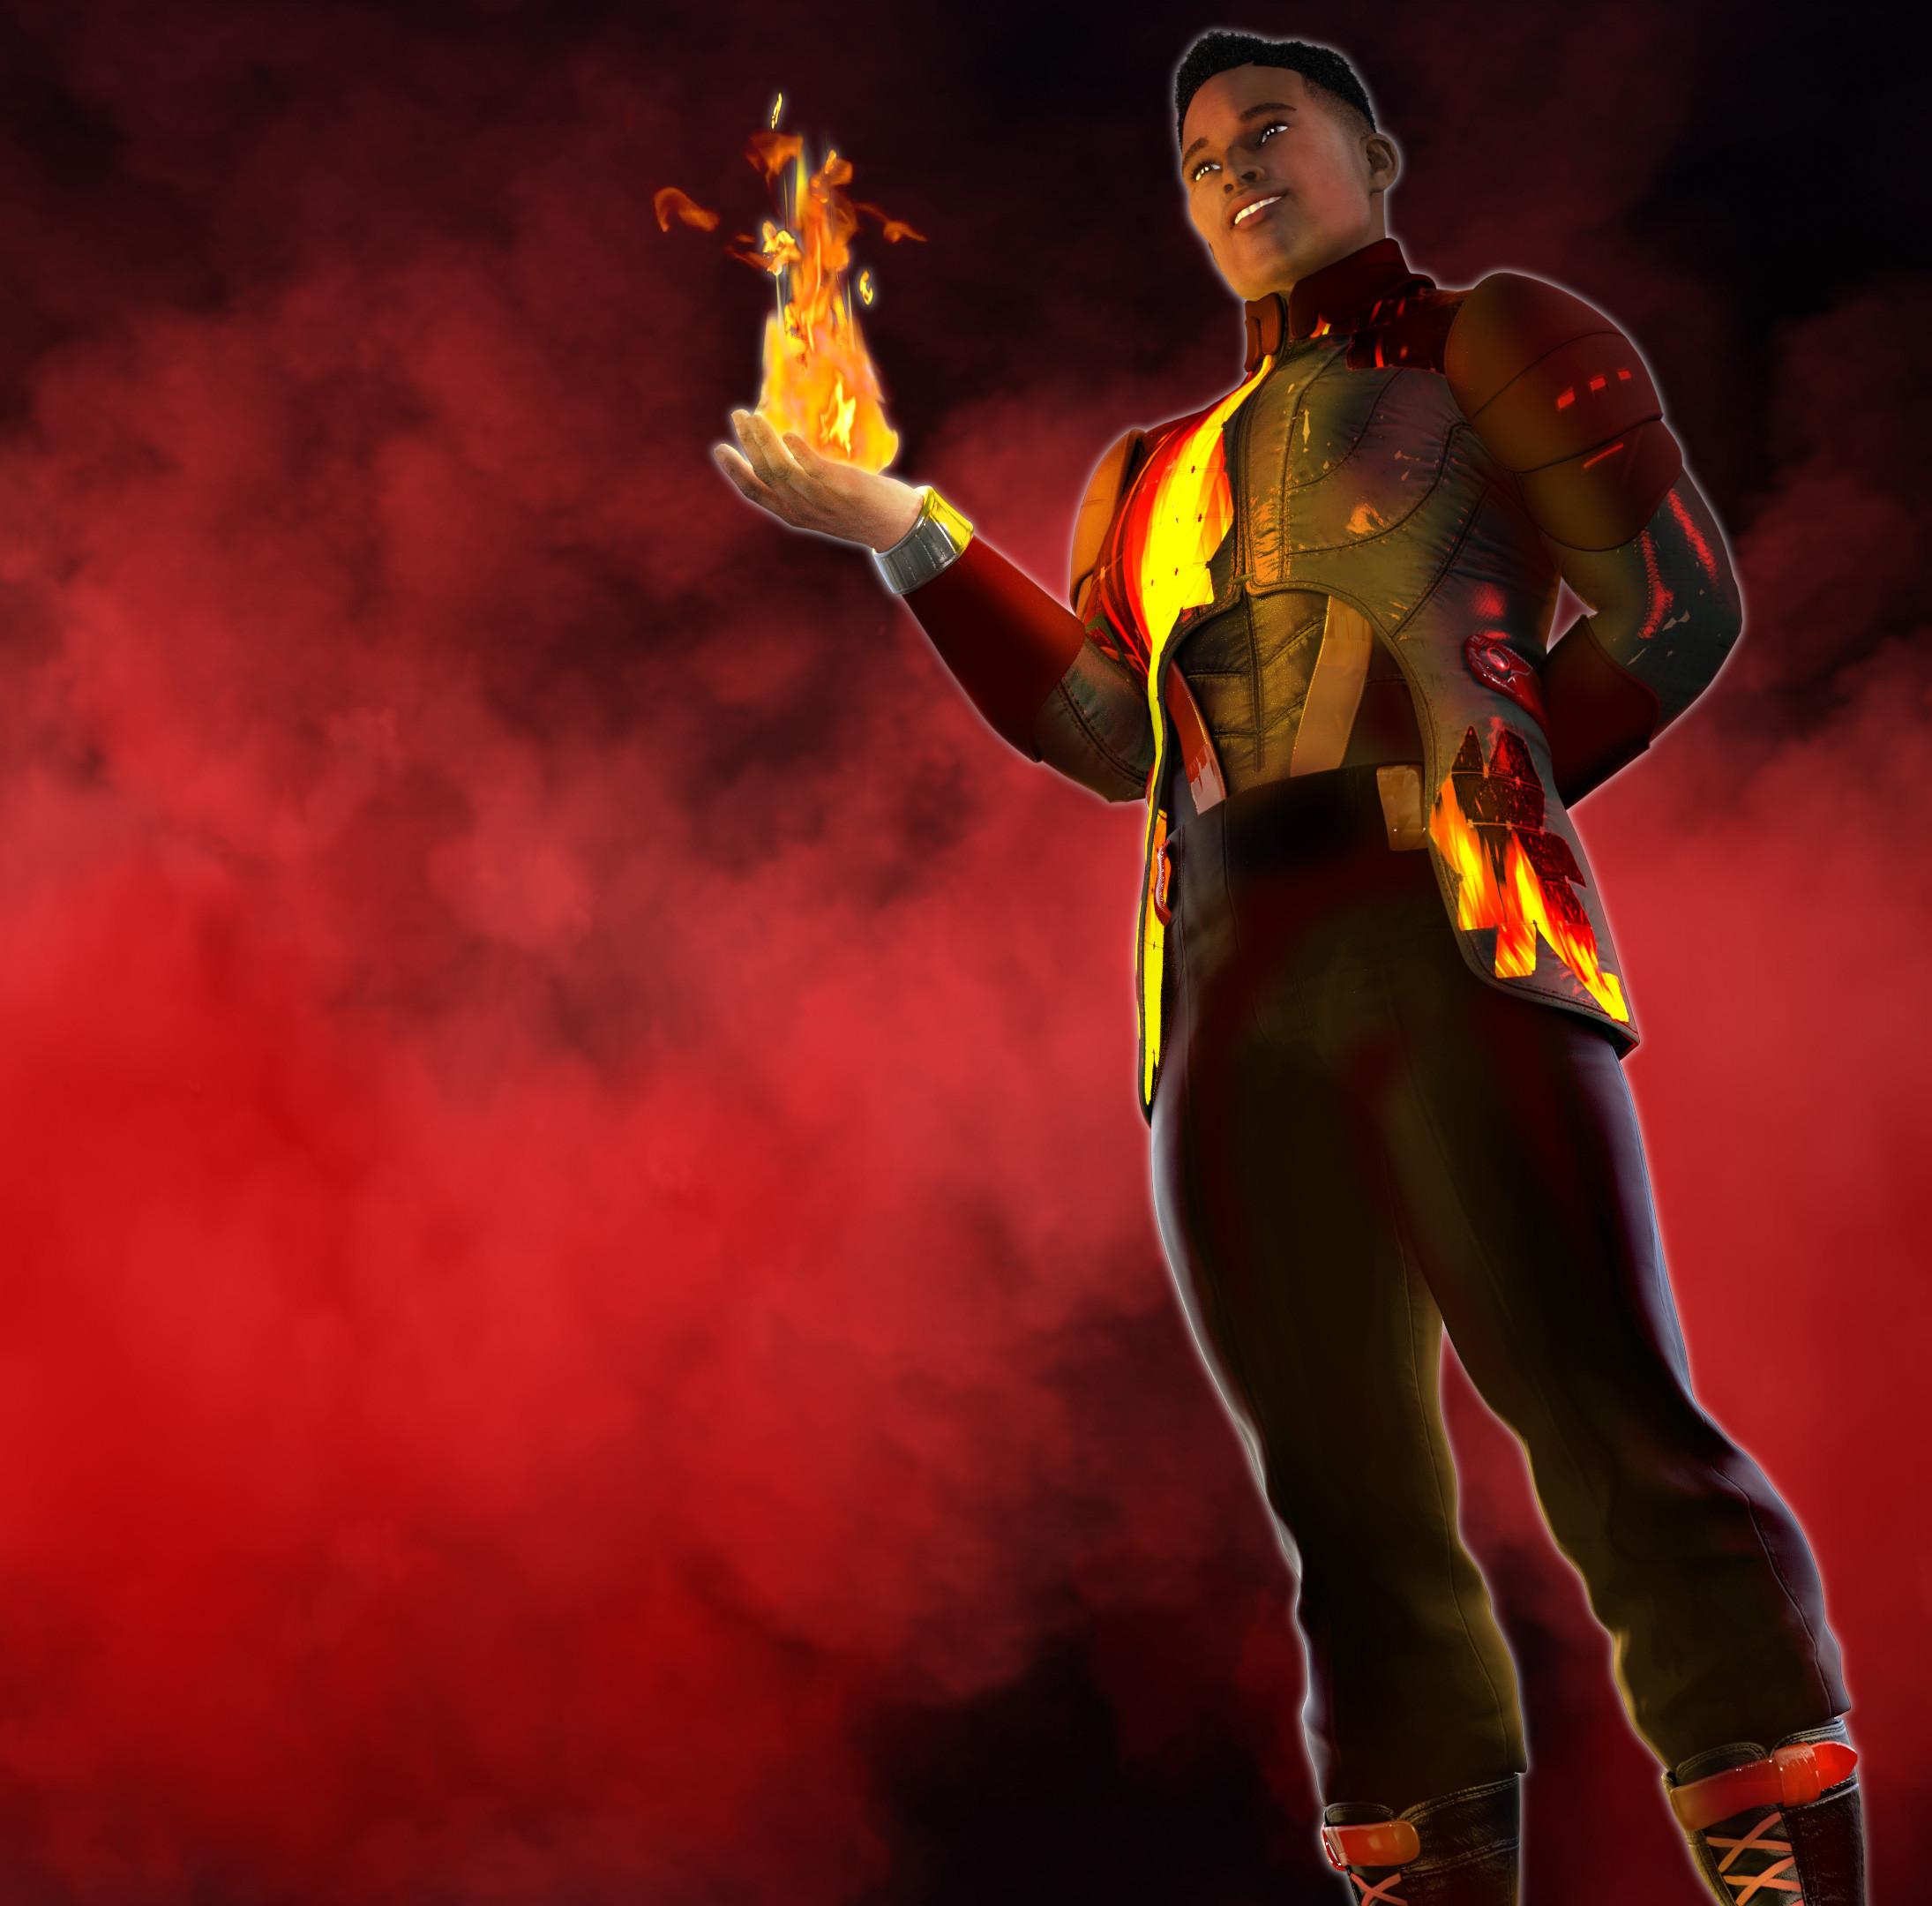 Brother Blaze